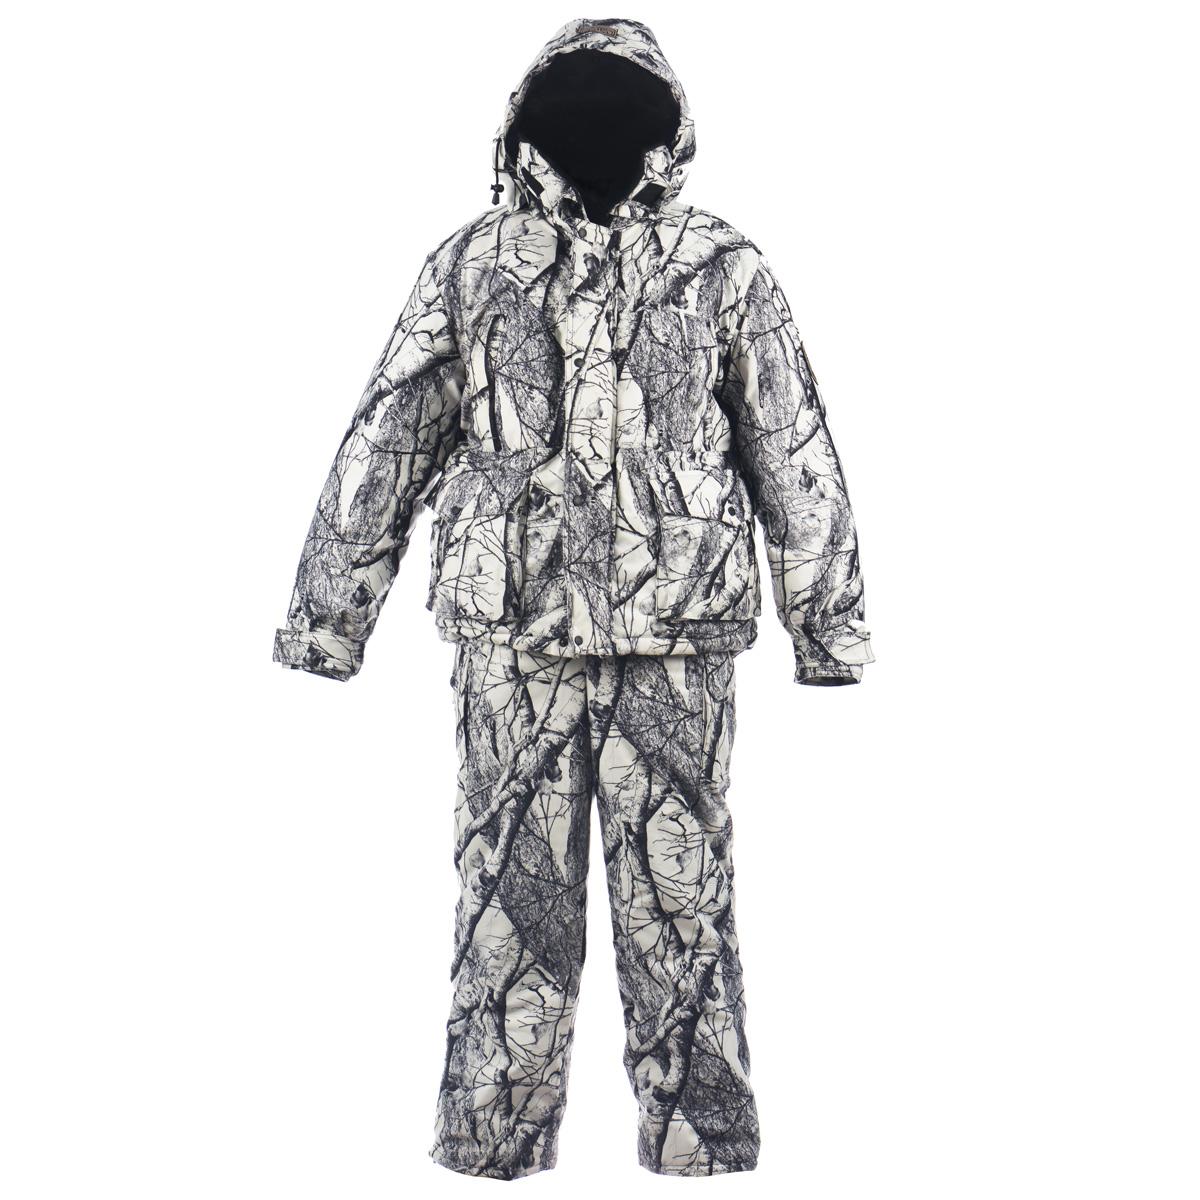 Комплект мужской Huntsman Буран-М: куртка, полукомбинезон, цвет: белый лес. Размер 56/58